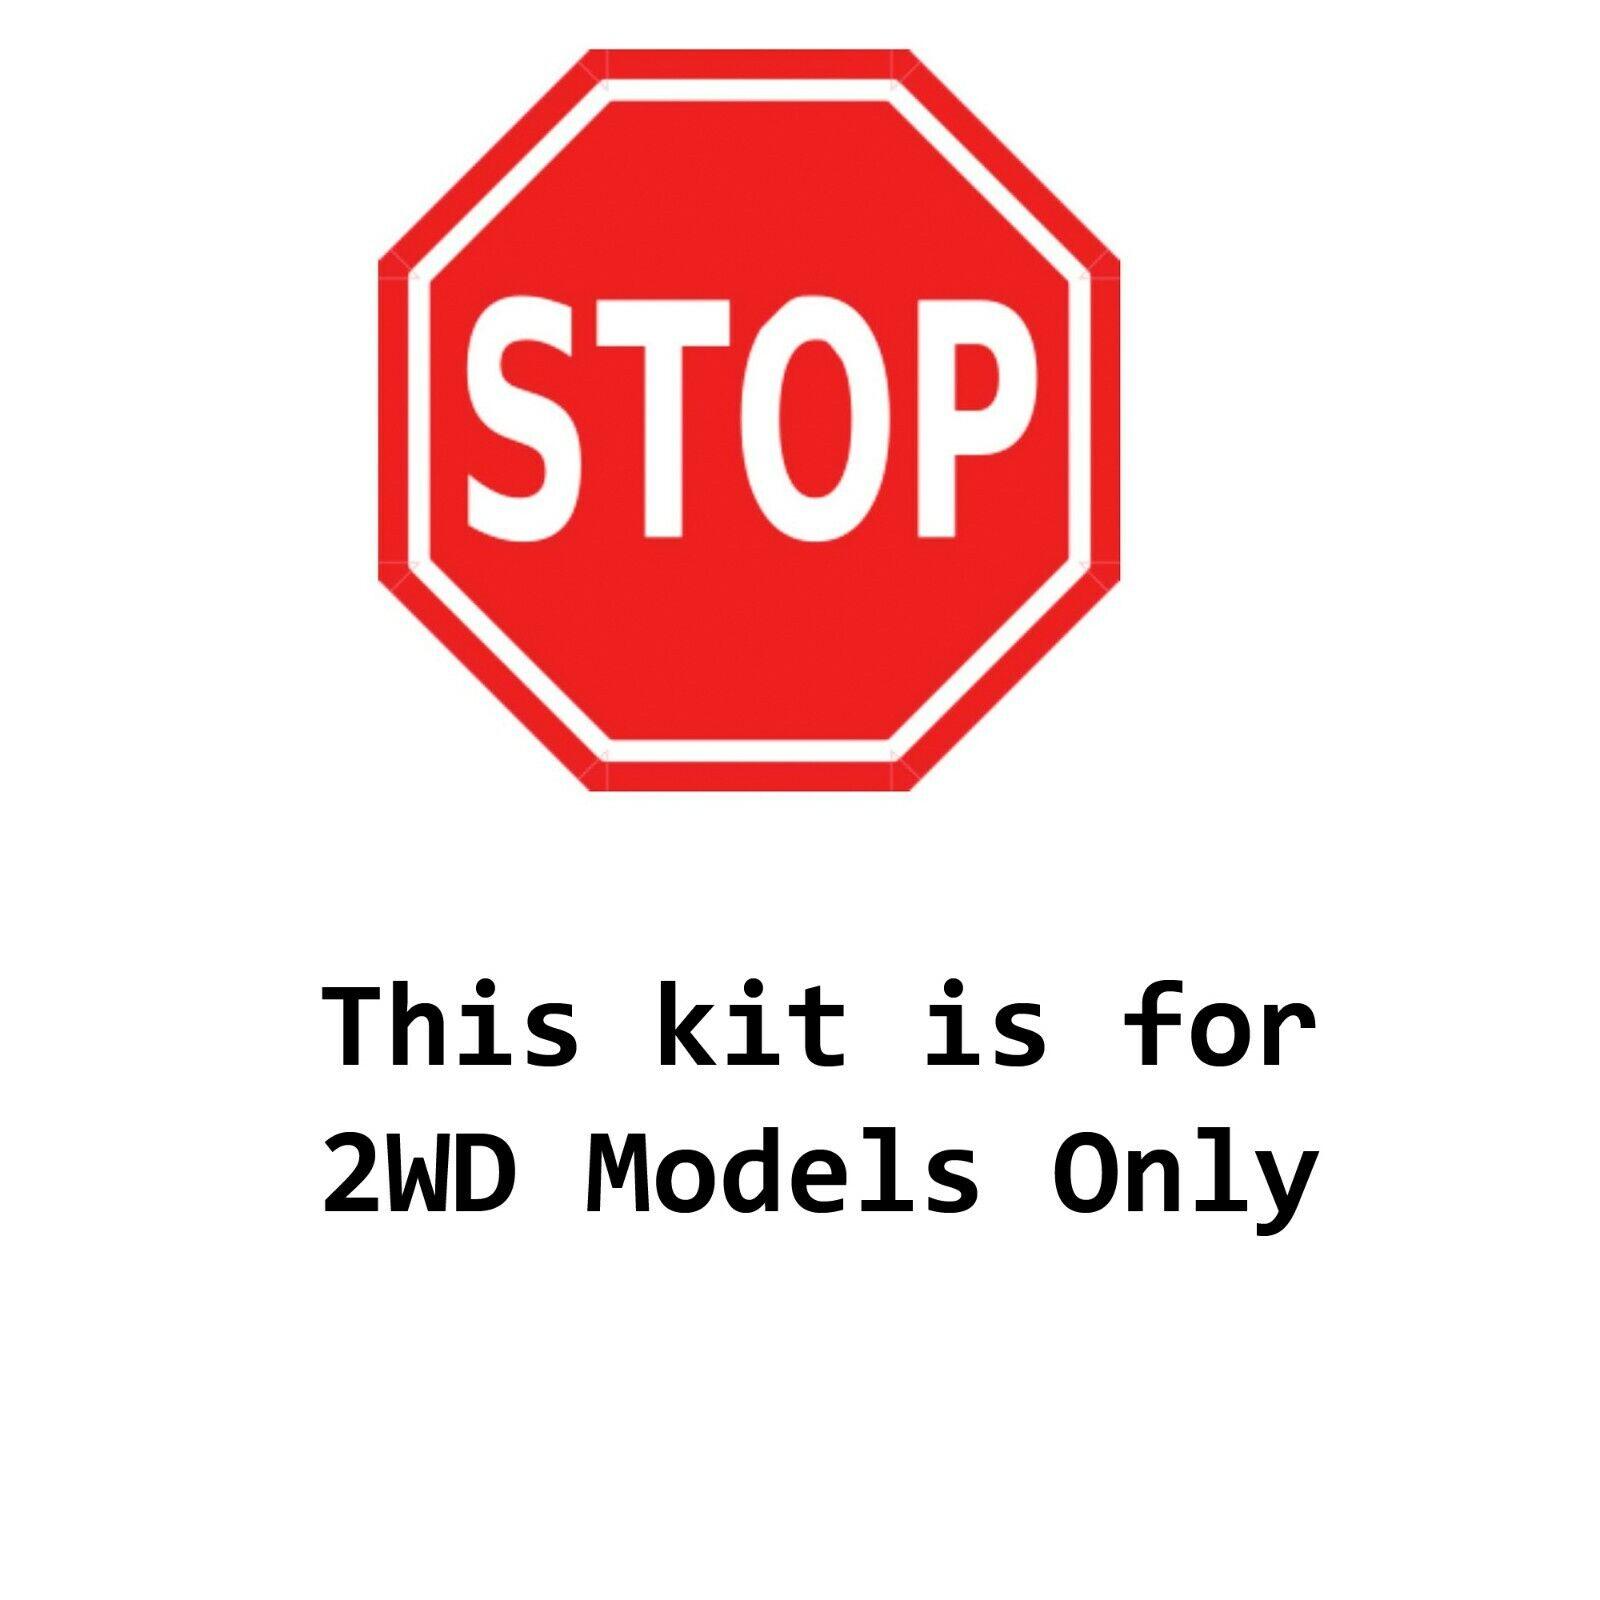 ::For 2005 2006 2007 2008 2009 2010 Dodge Charger 300 Front Suspension Kit